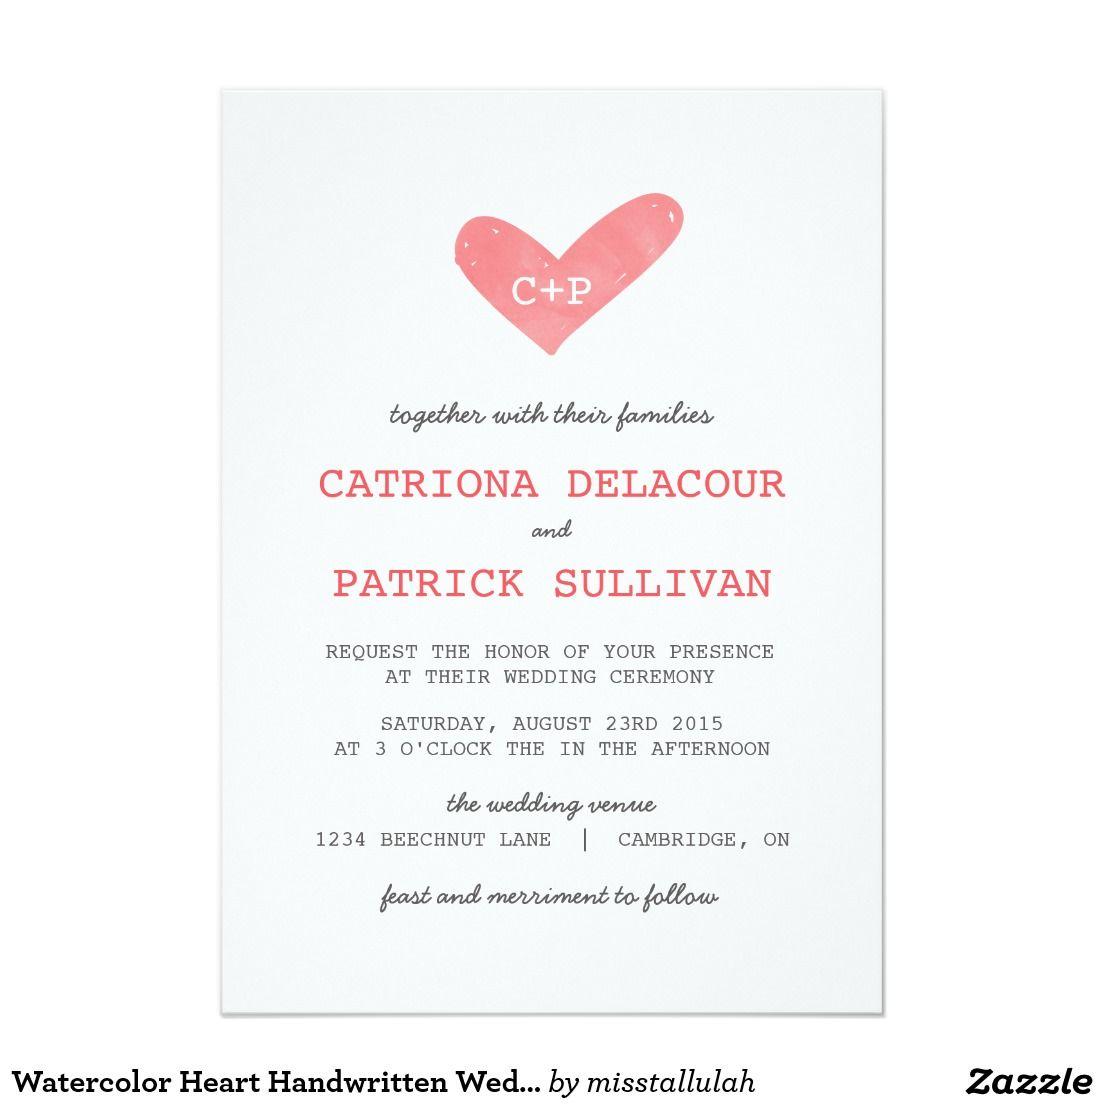 Watercolor Heart Handwritten Wedding Invitations | HEART WEDDING ...